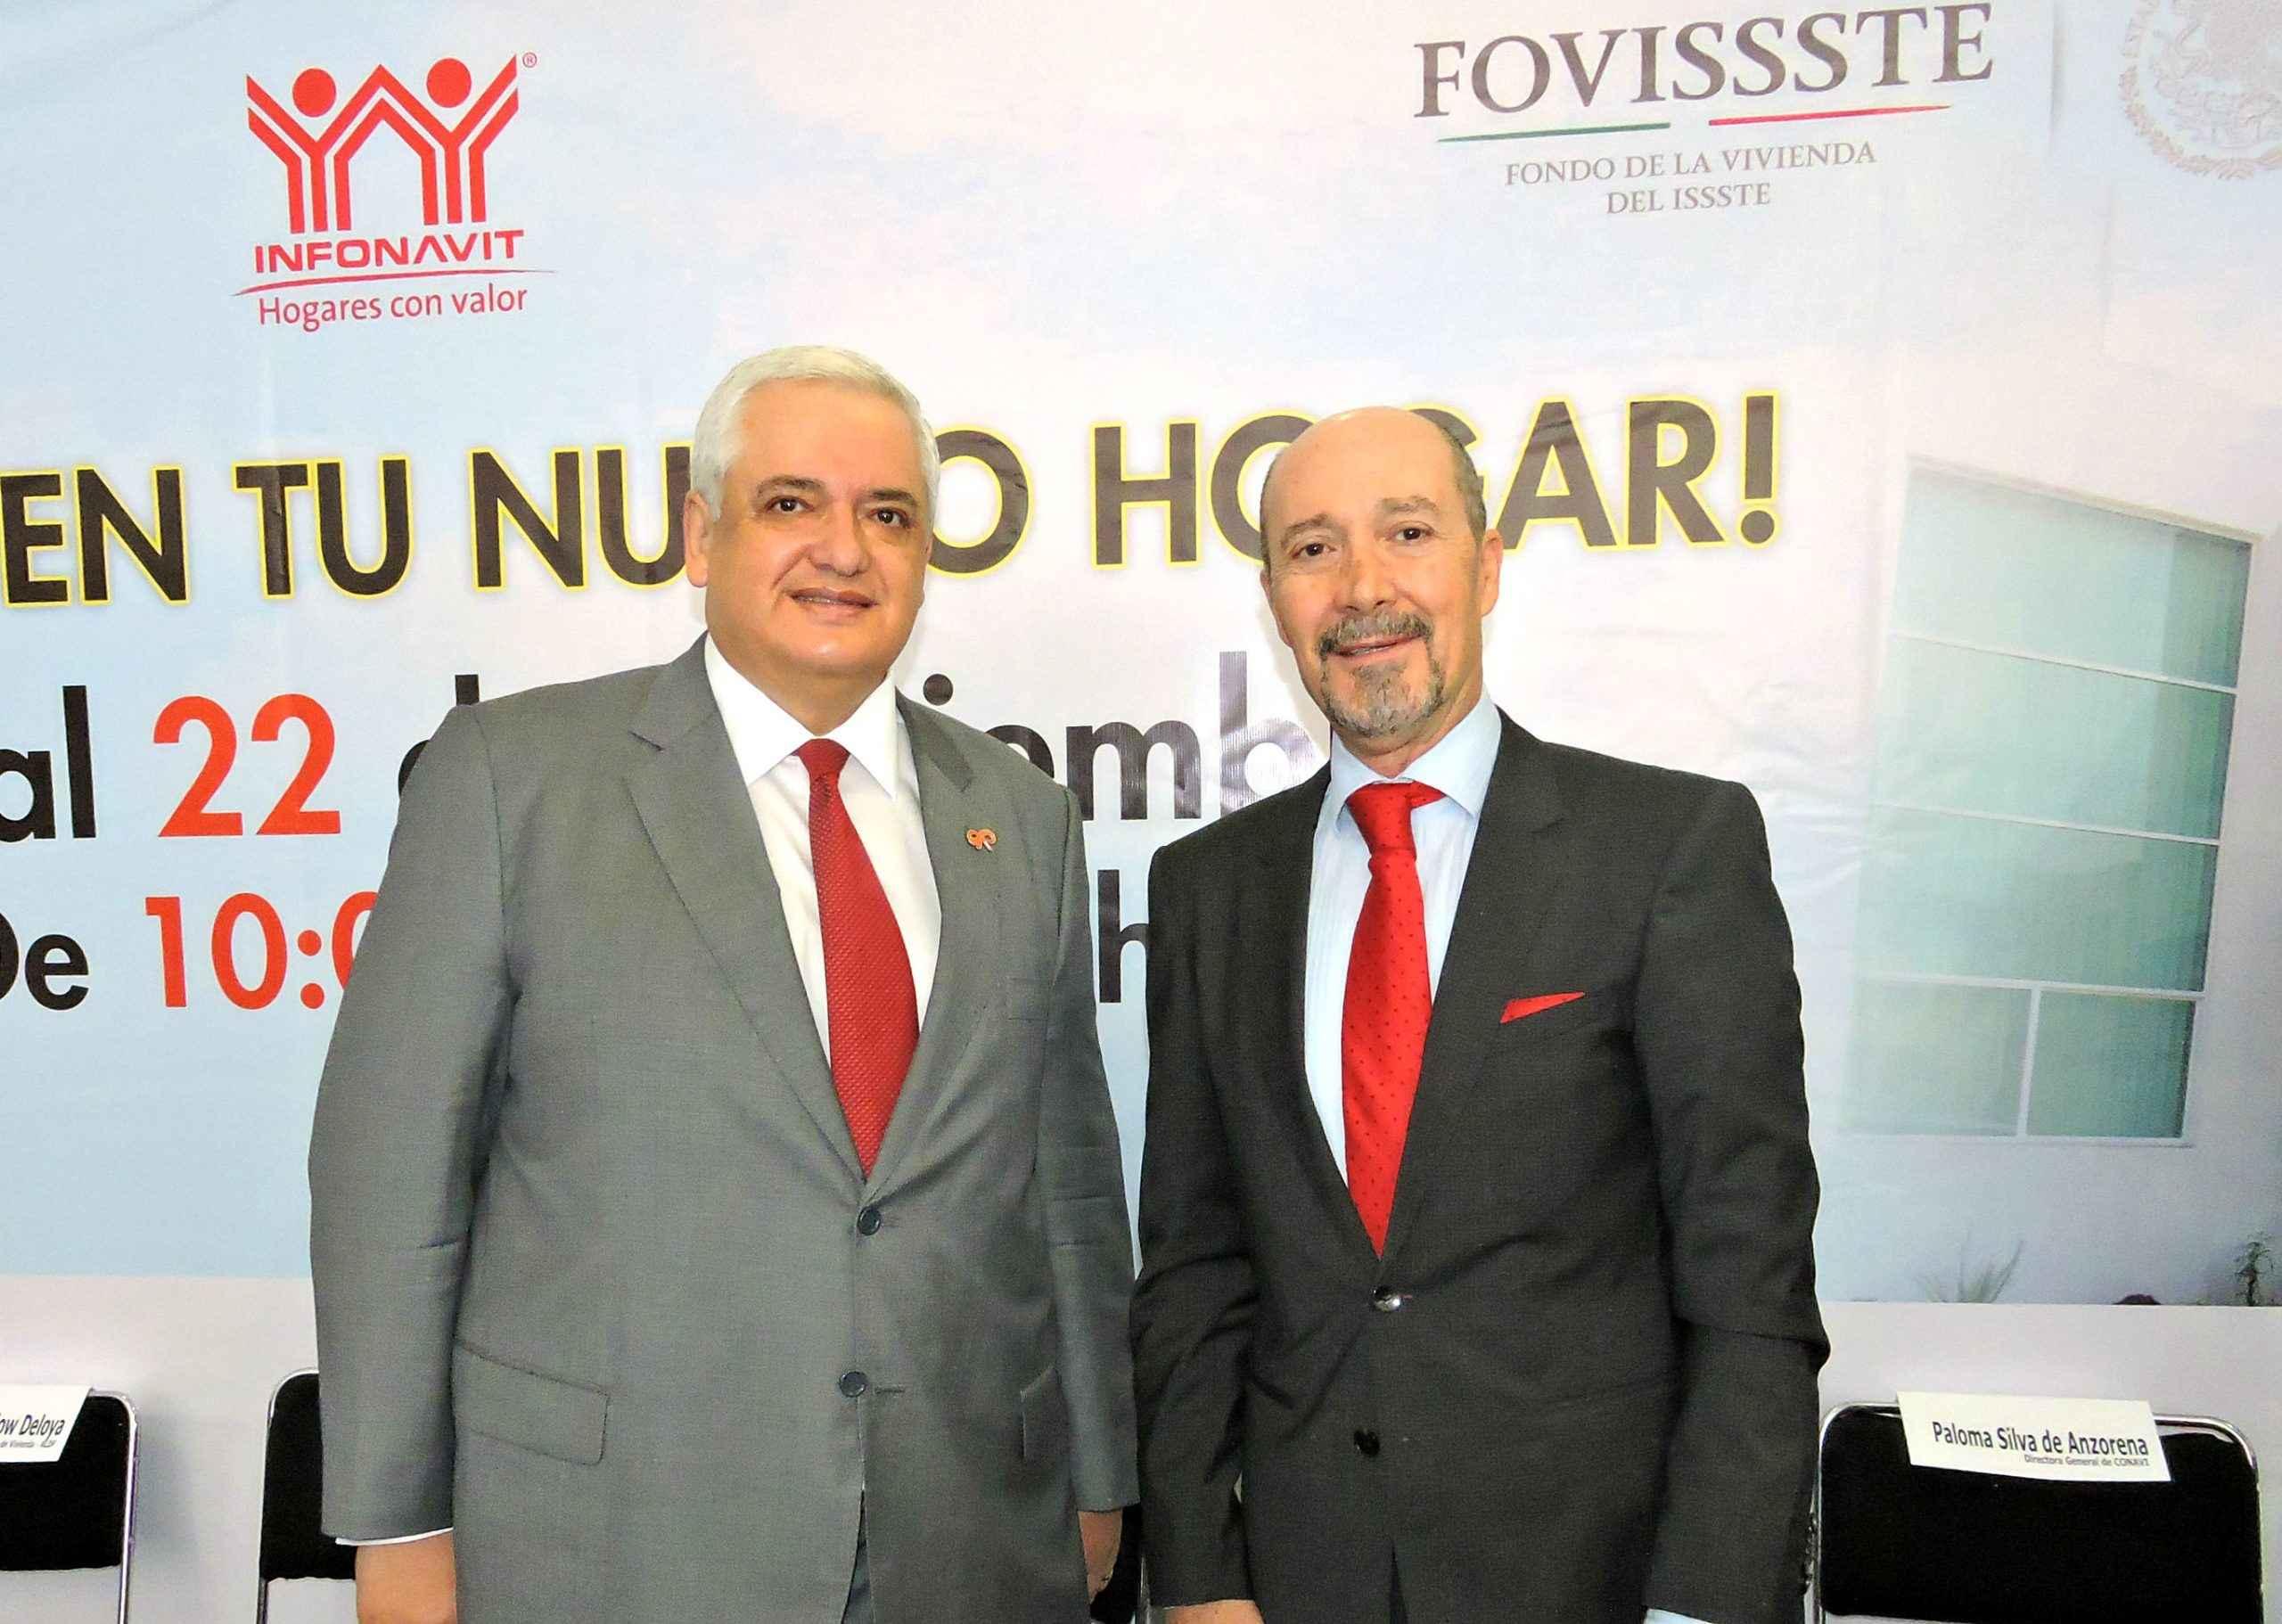 Lanzarán en 2017 crédito conjunto Fovissste-Infonavit